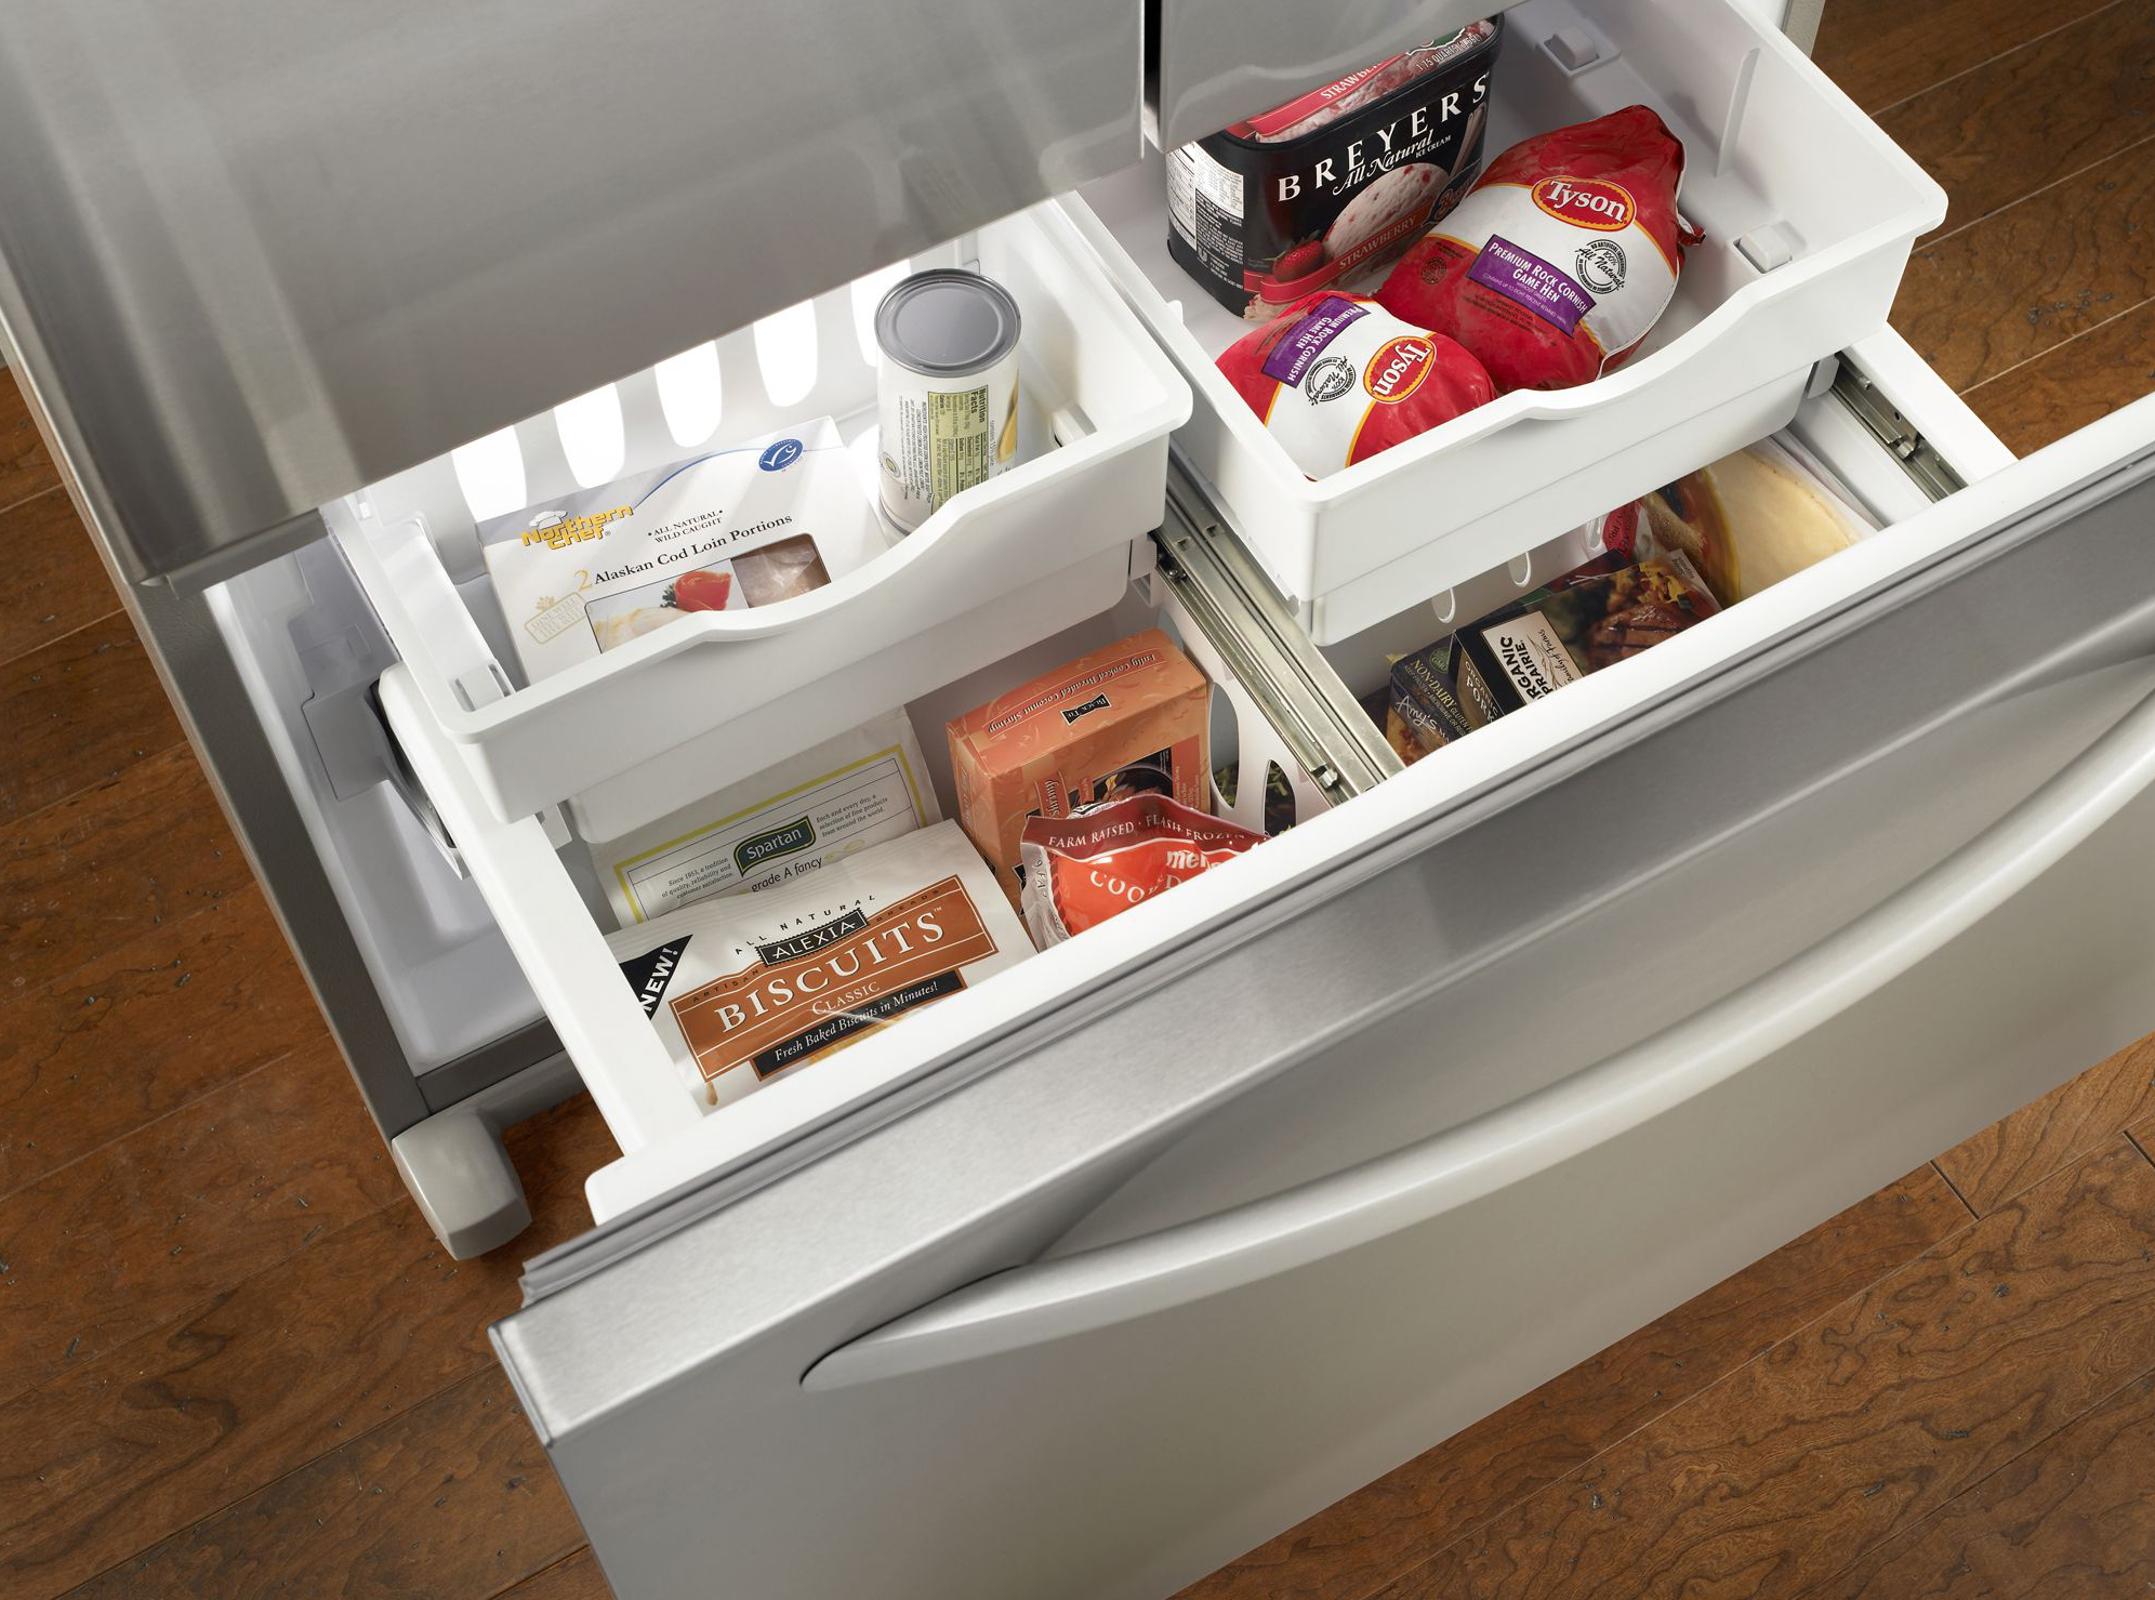 KitchenAid 19.7 cu. Ft. Series II French Door Refrigerator